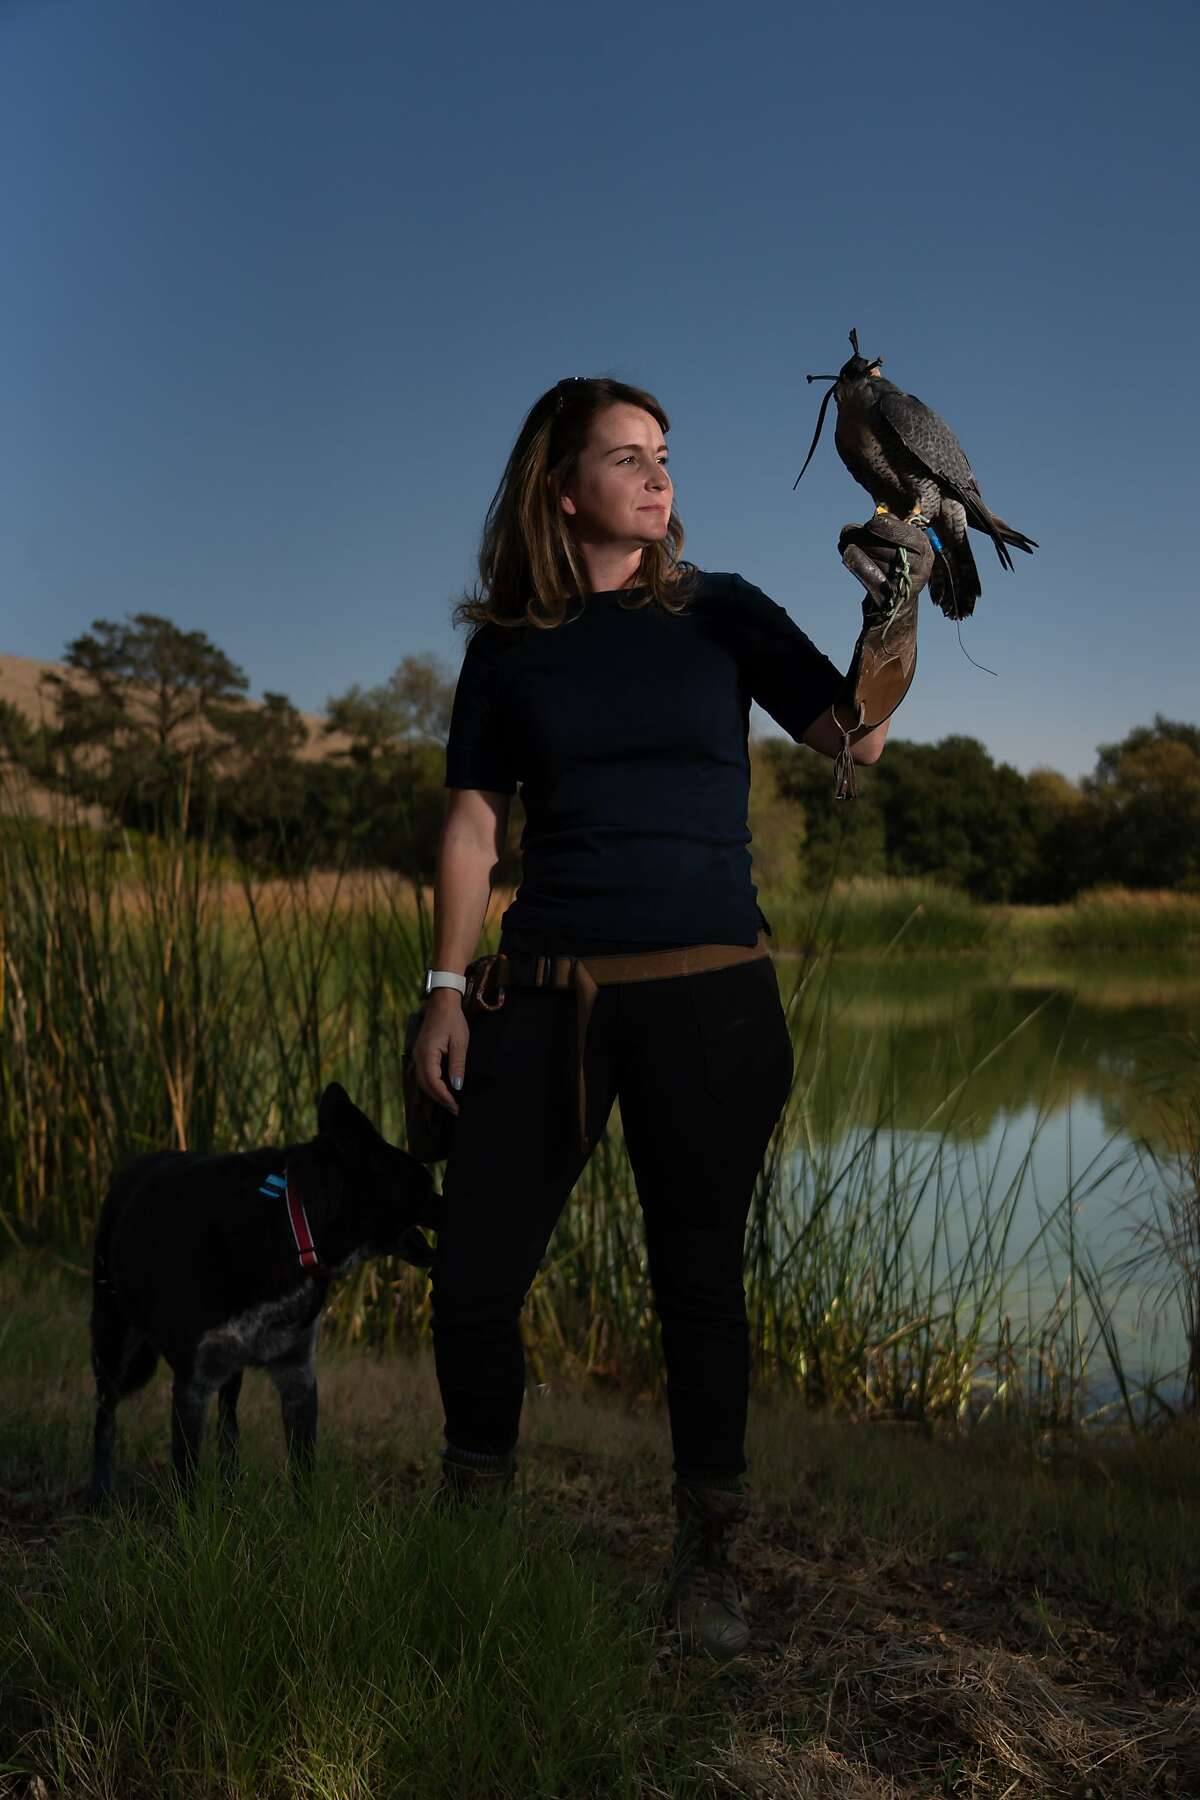 Rebecca Rosen holds Rambo, a peregrine falcon, on Saturday, Oct. 12, 2019, in Napa, Calif.